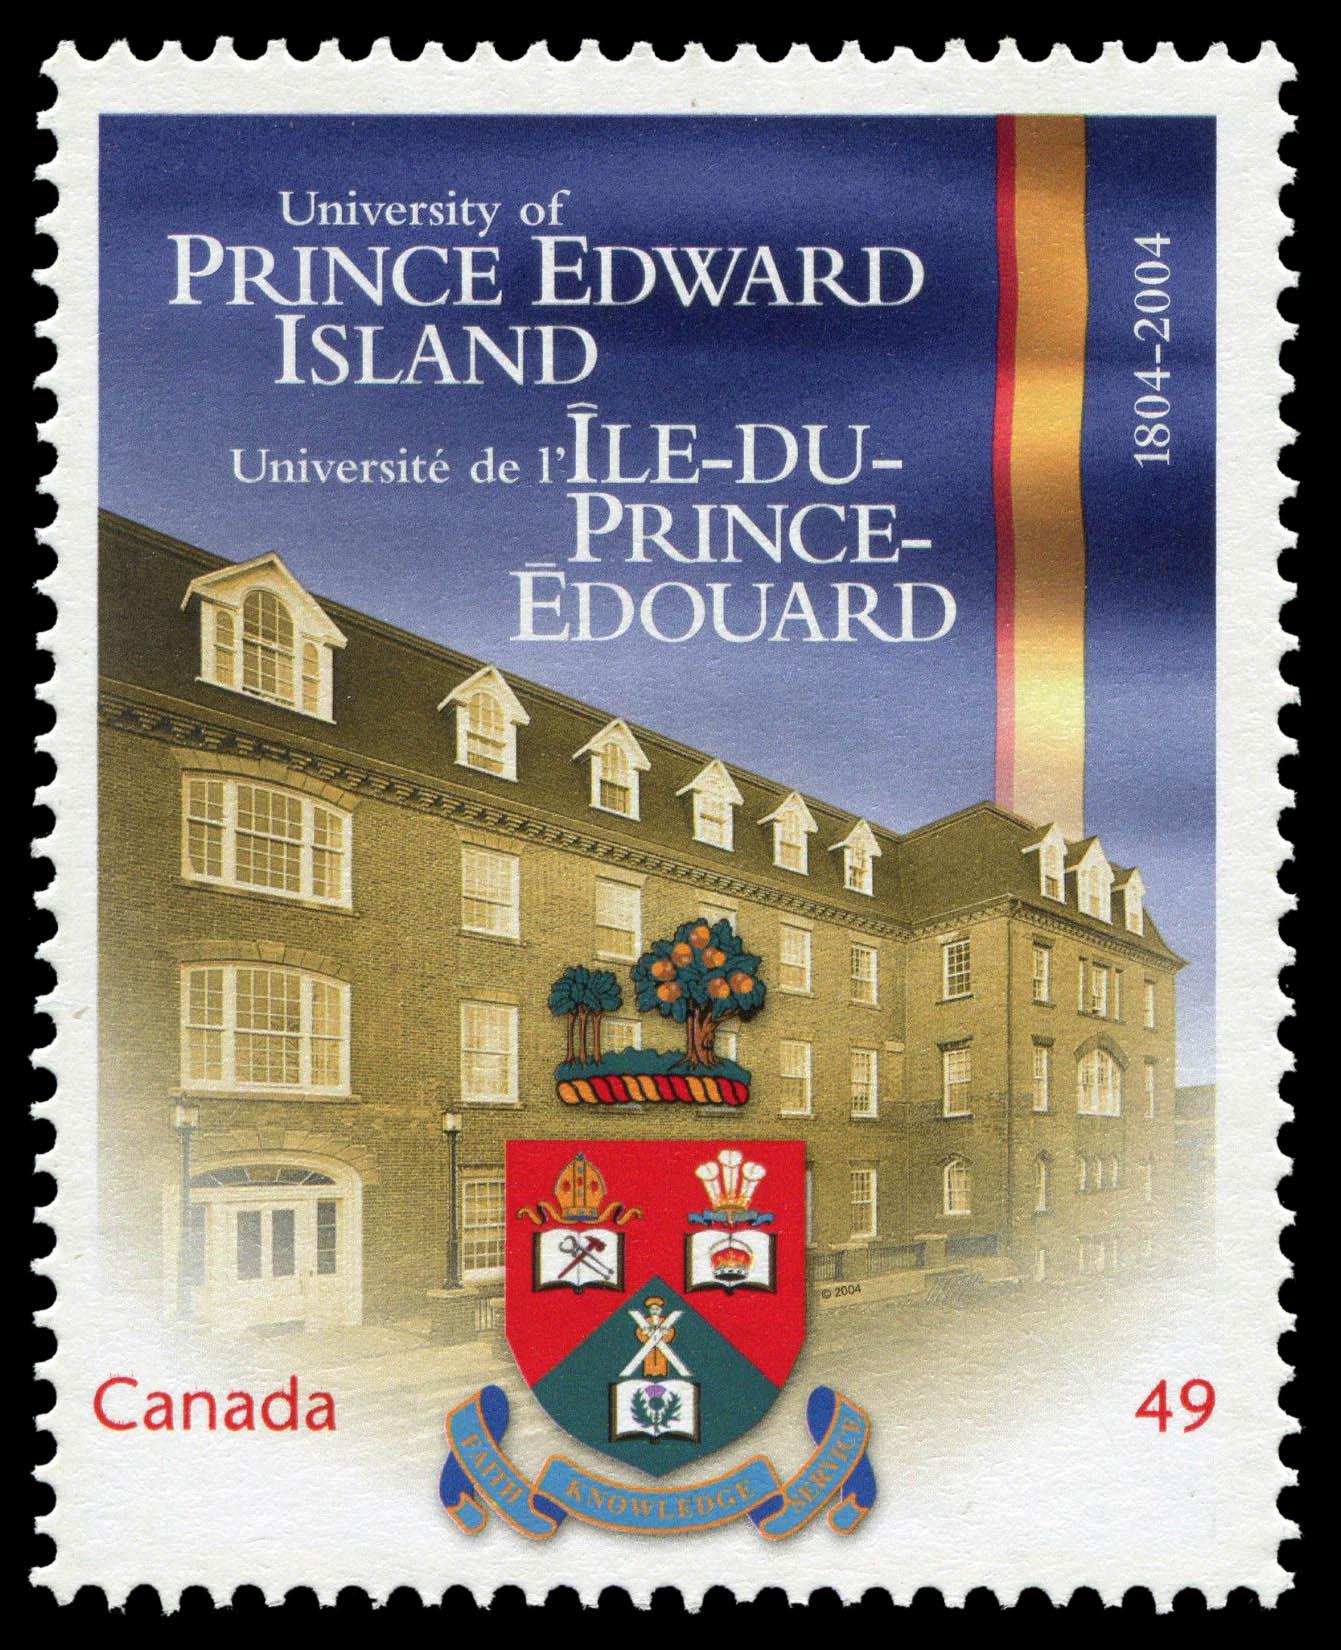 University of Prince Edward Island, 1804-2004 Canada Postage Stamp